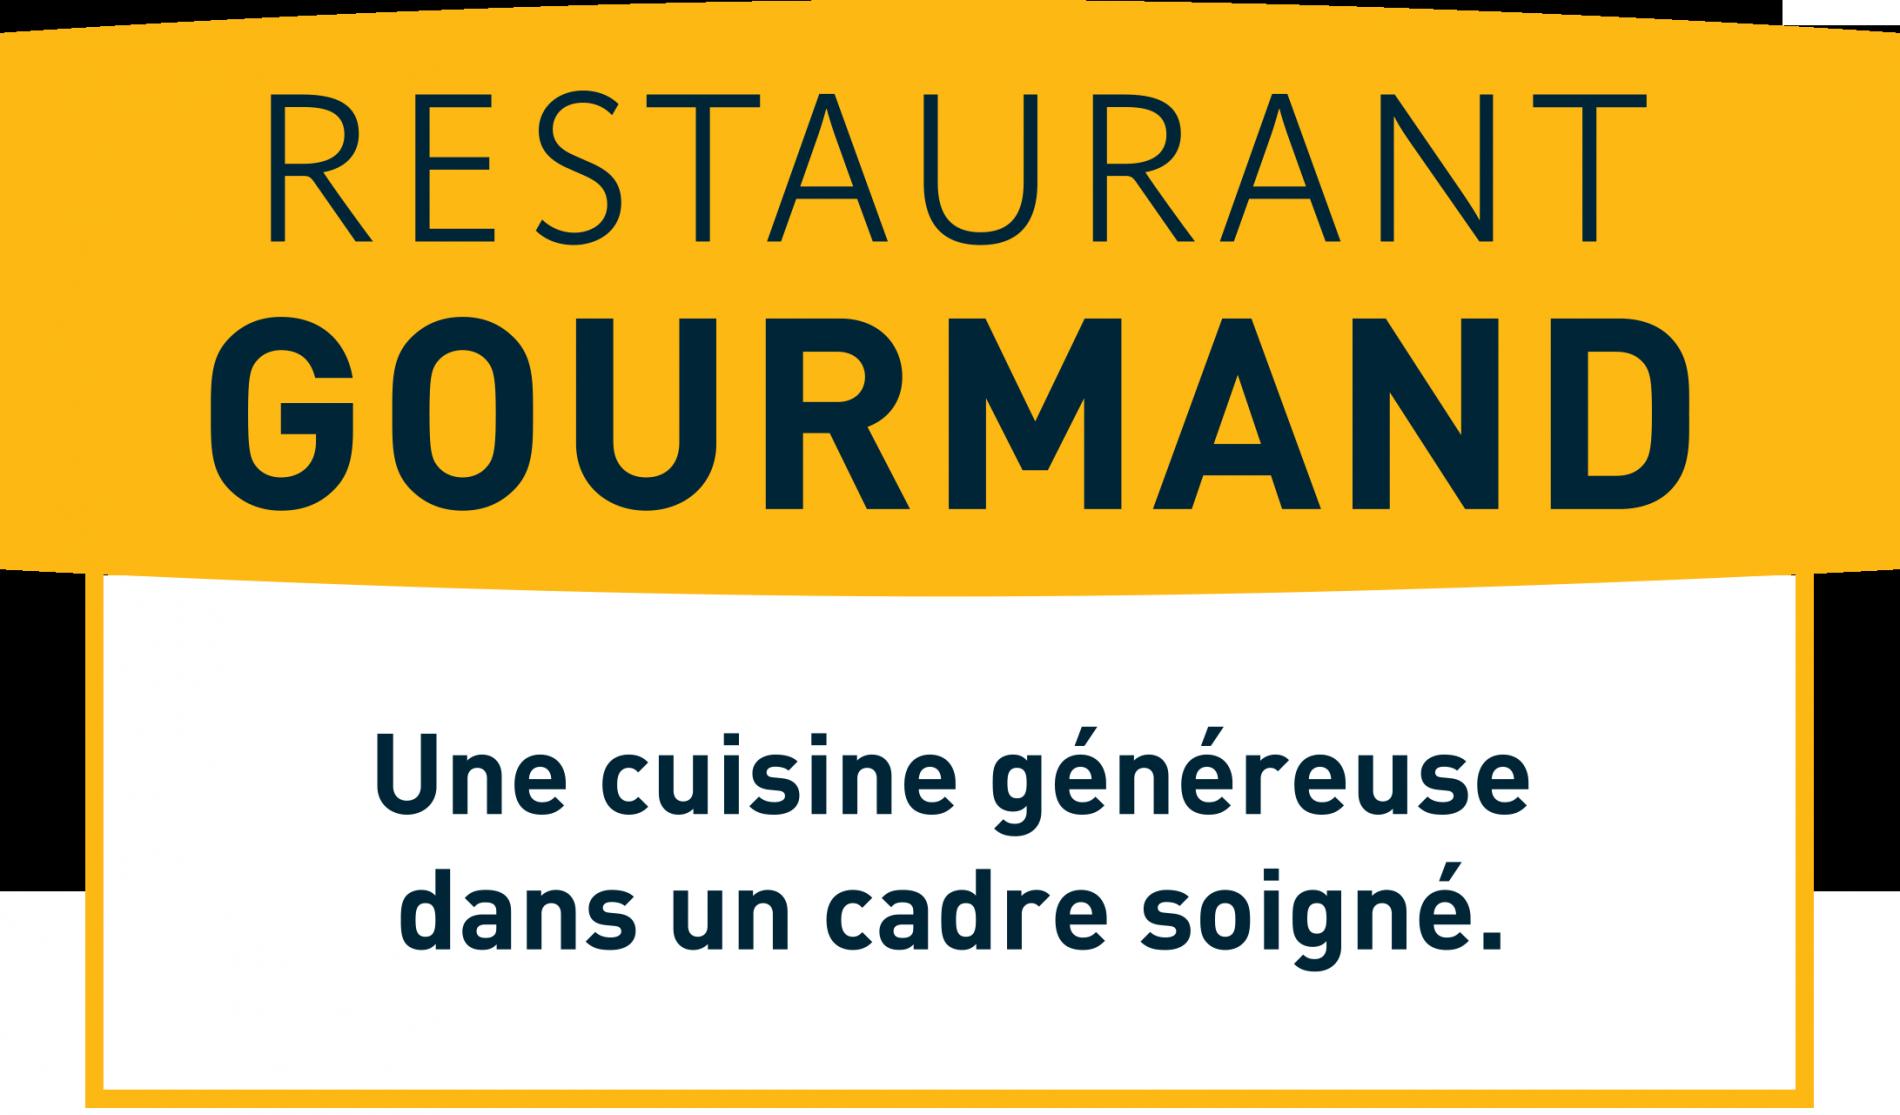 Hôtel de la Basilique à Albert, logo Logis Restaurant Gourmand